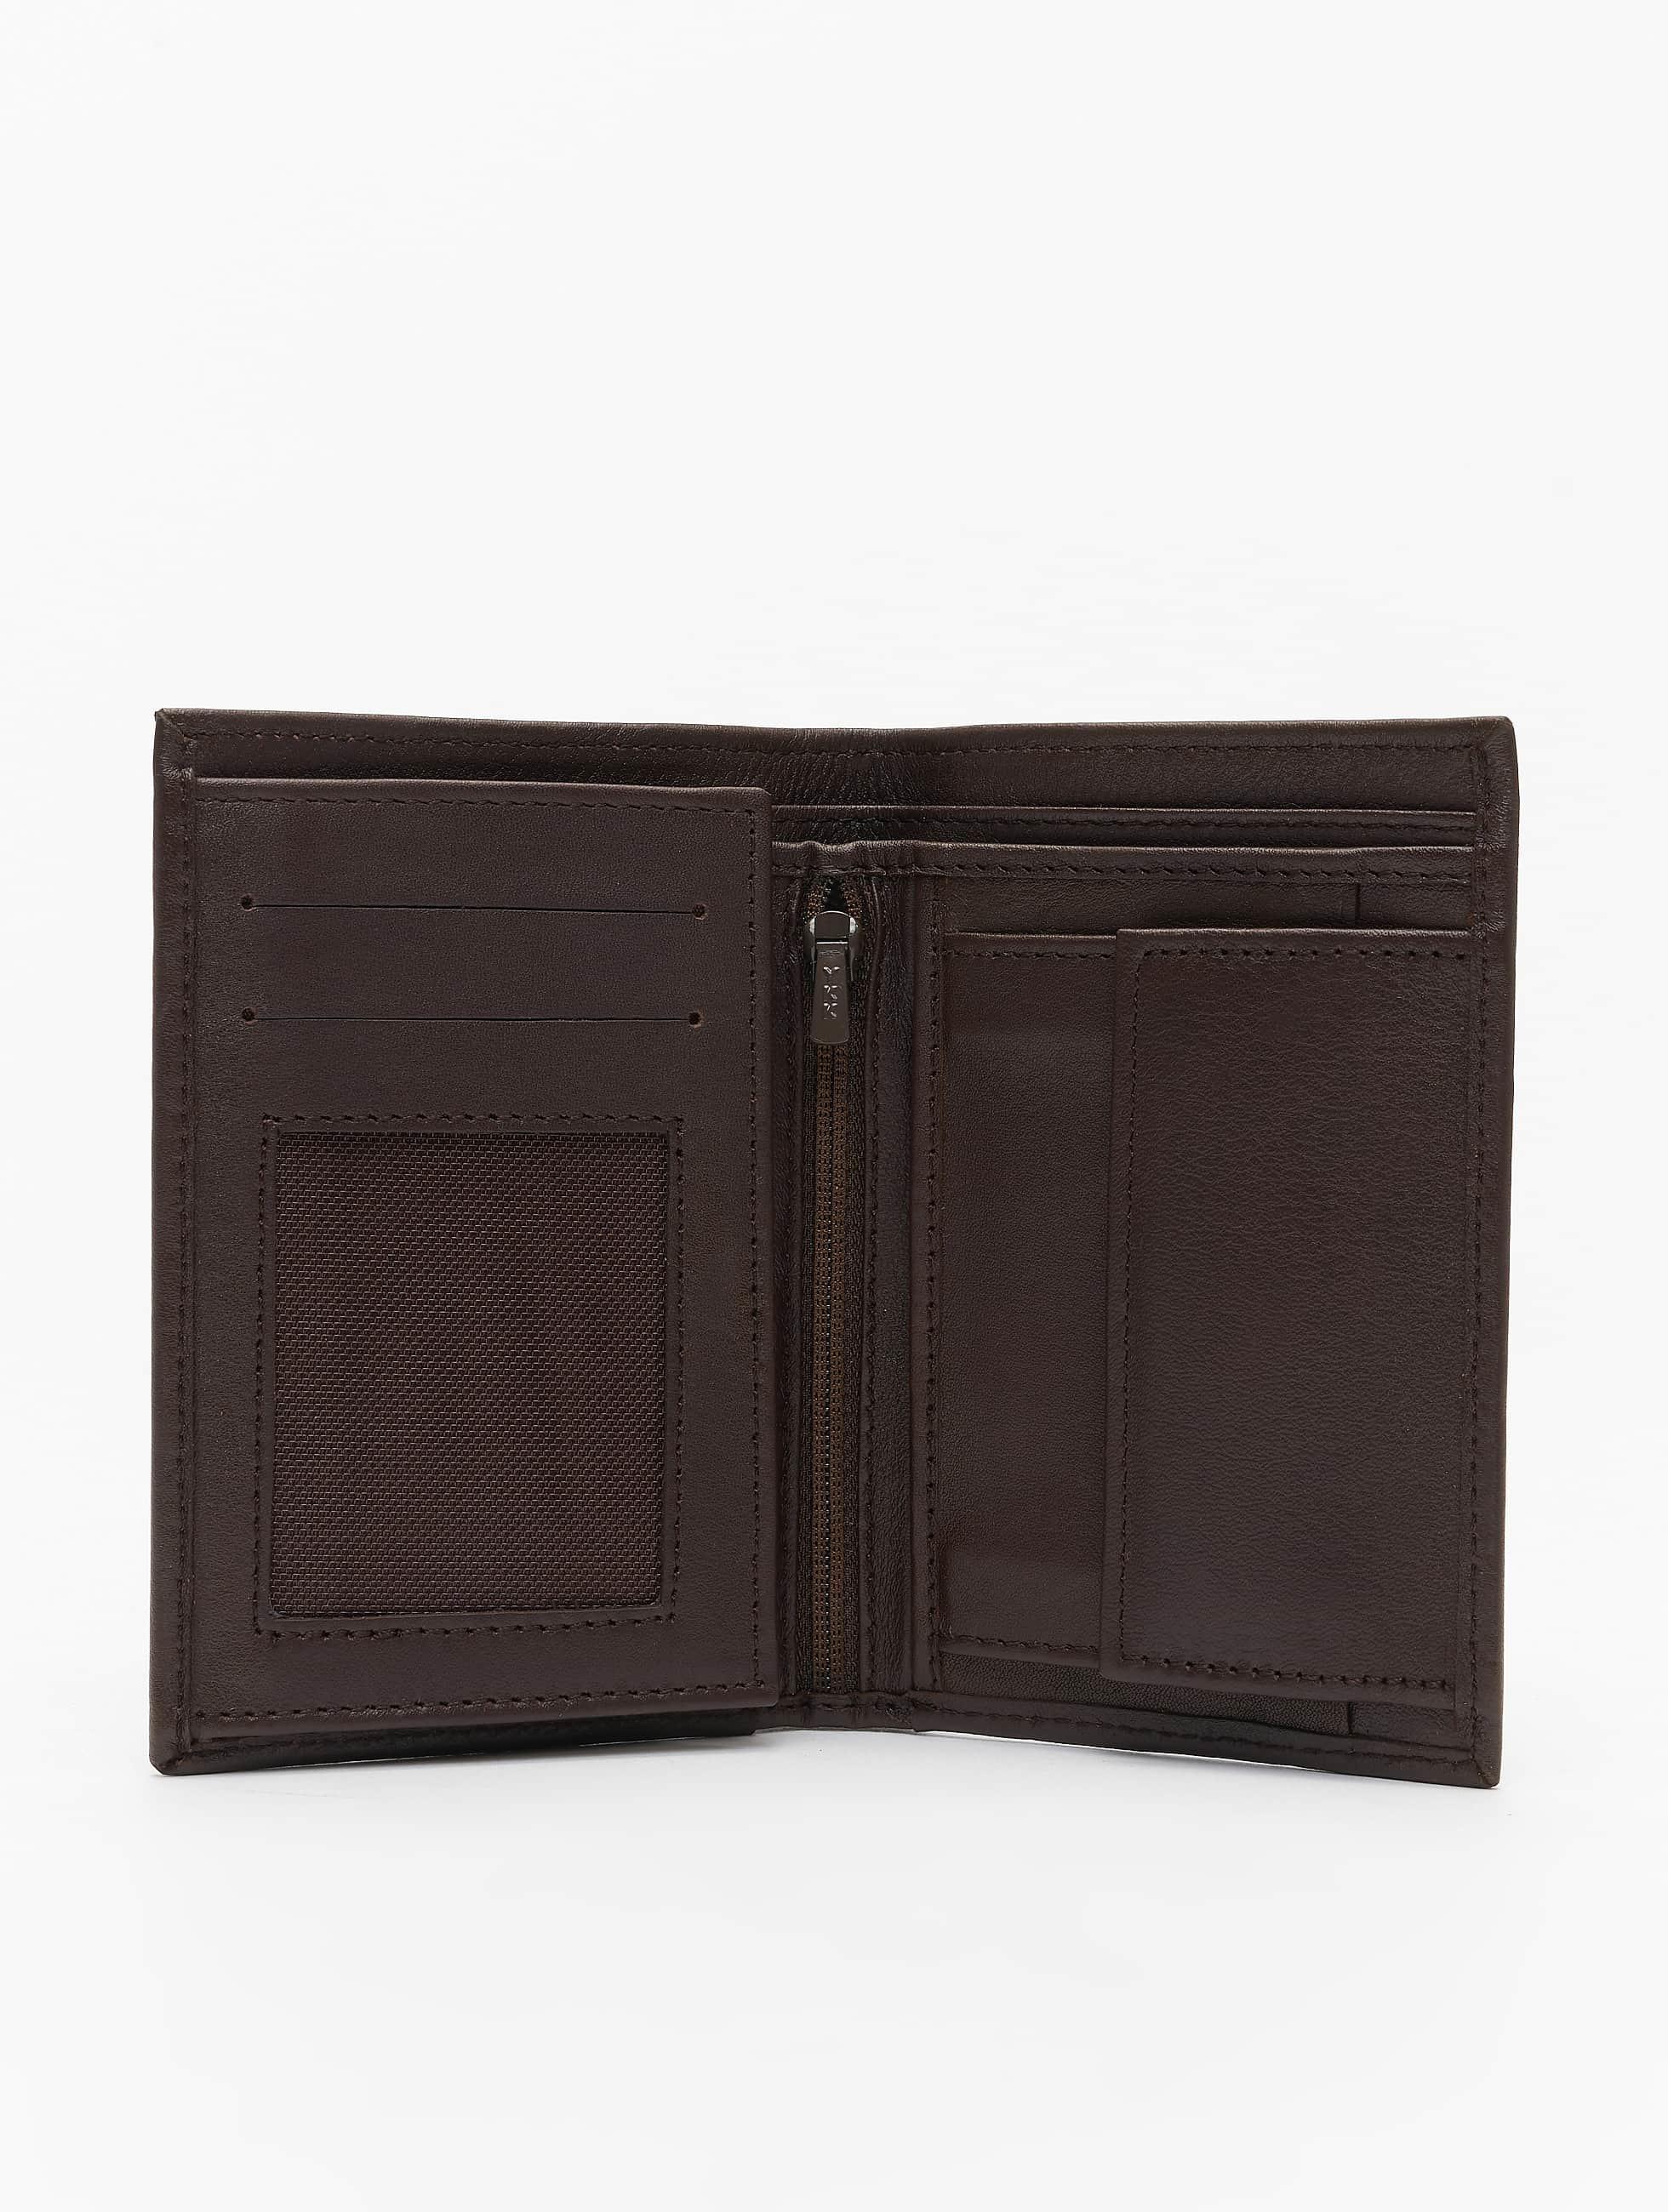 Reell Jeans Кошелёк Trifold Leather коричневый